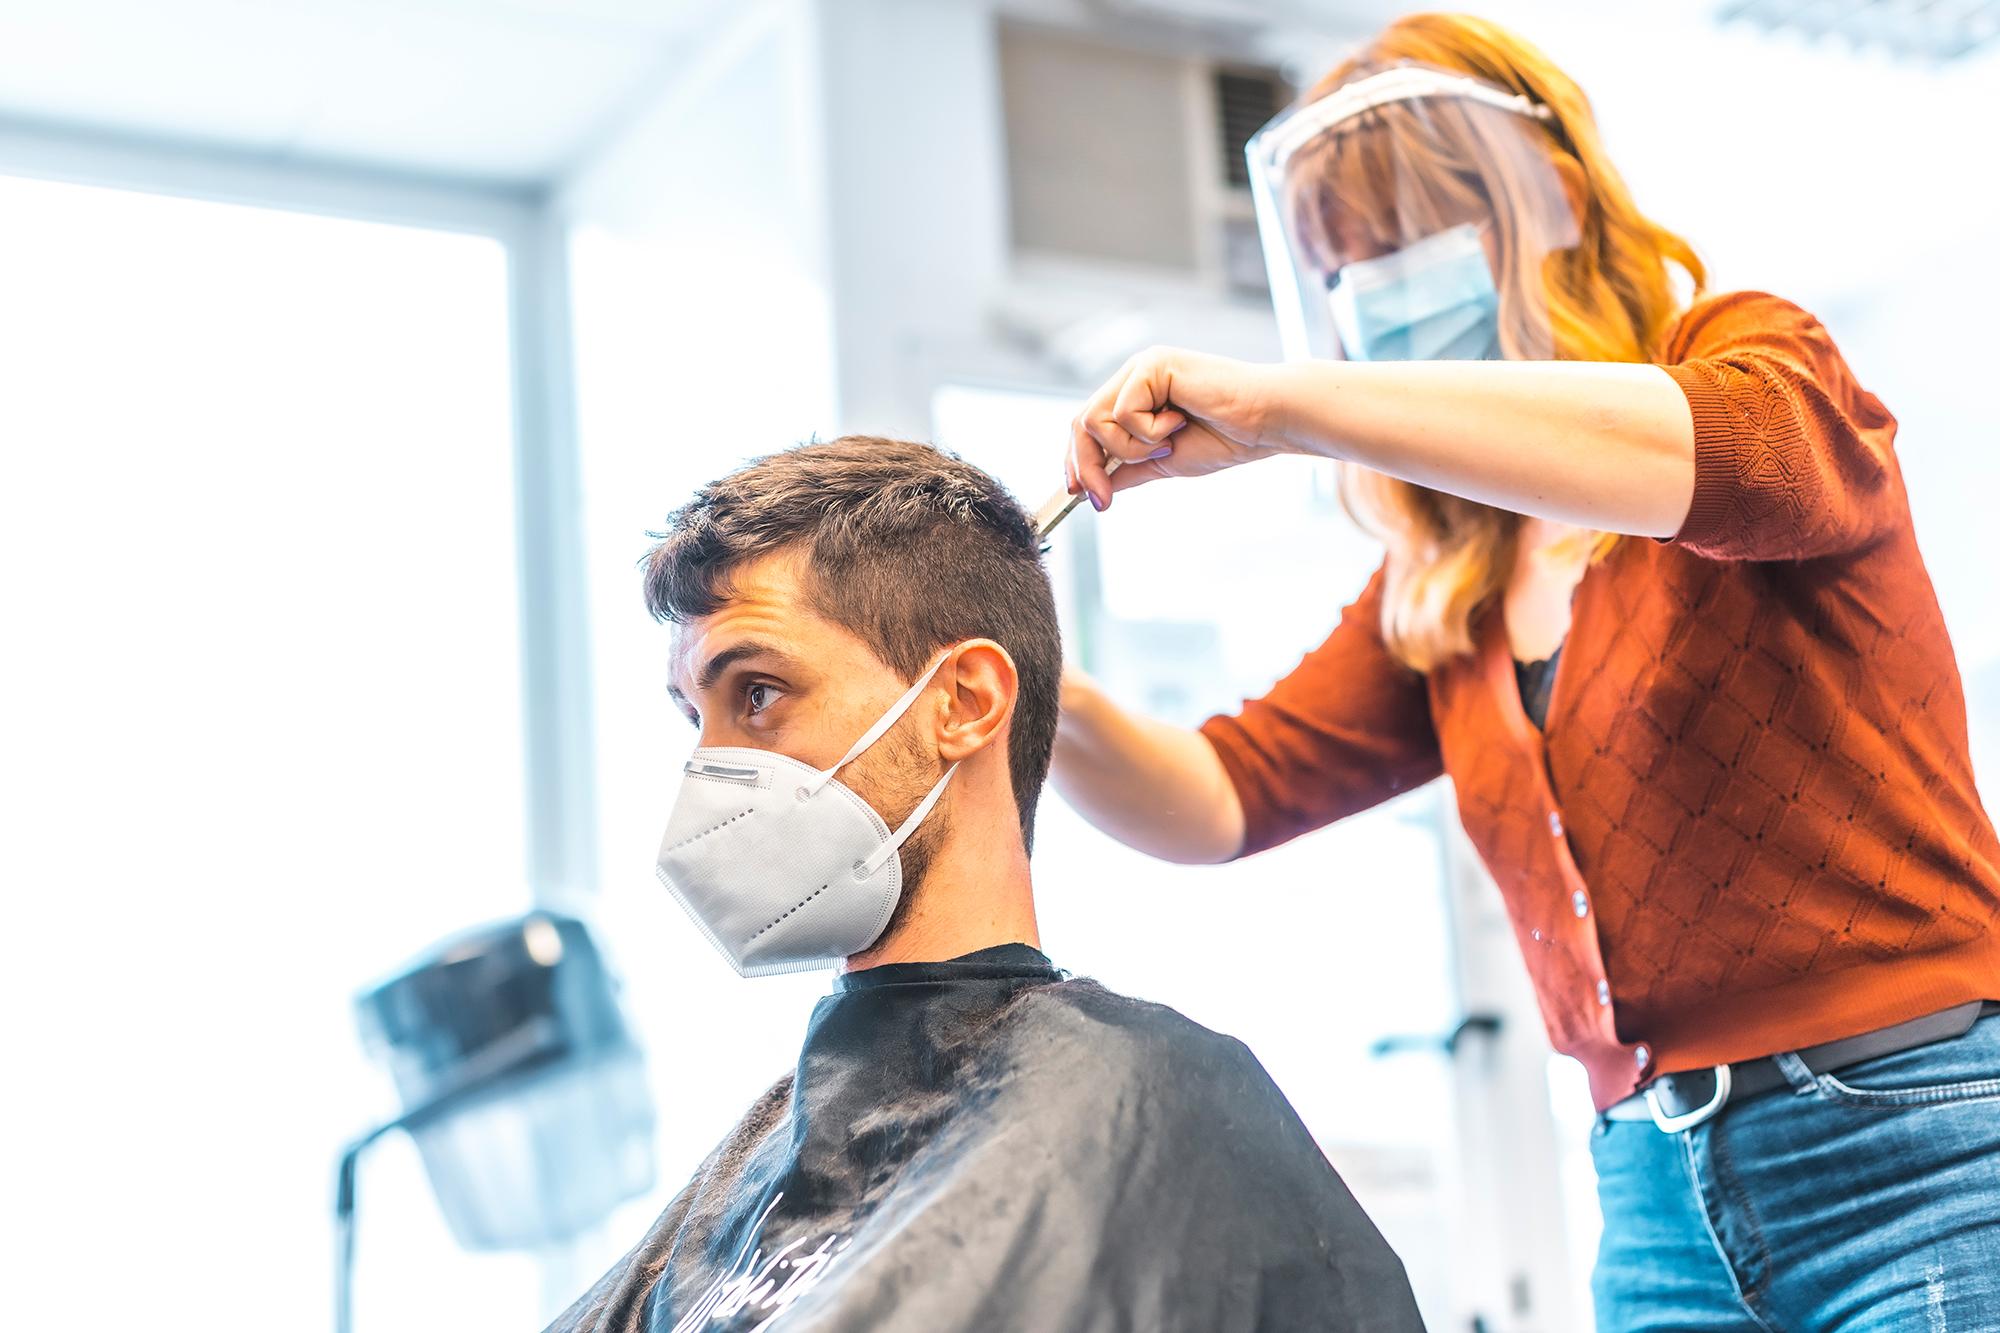 Woman cutting a man's hair. (Image: Shutterstock)